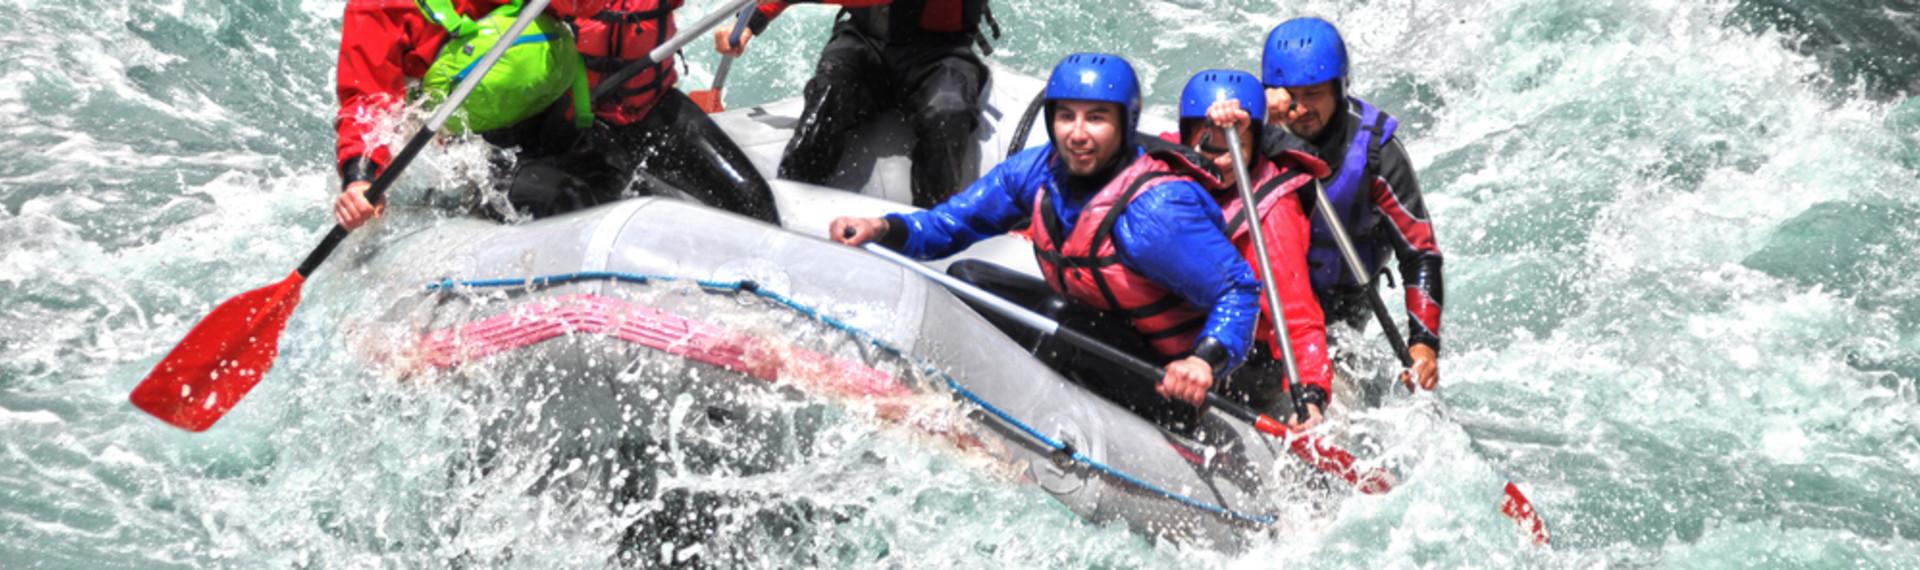 Bratislava White Water Rafting image